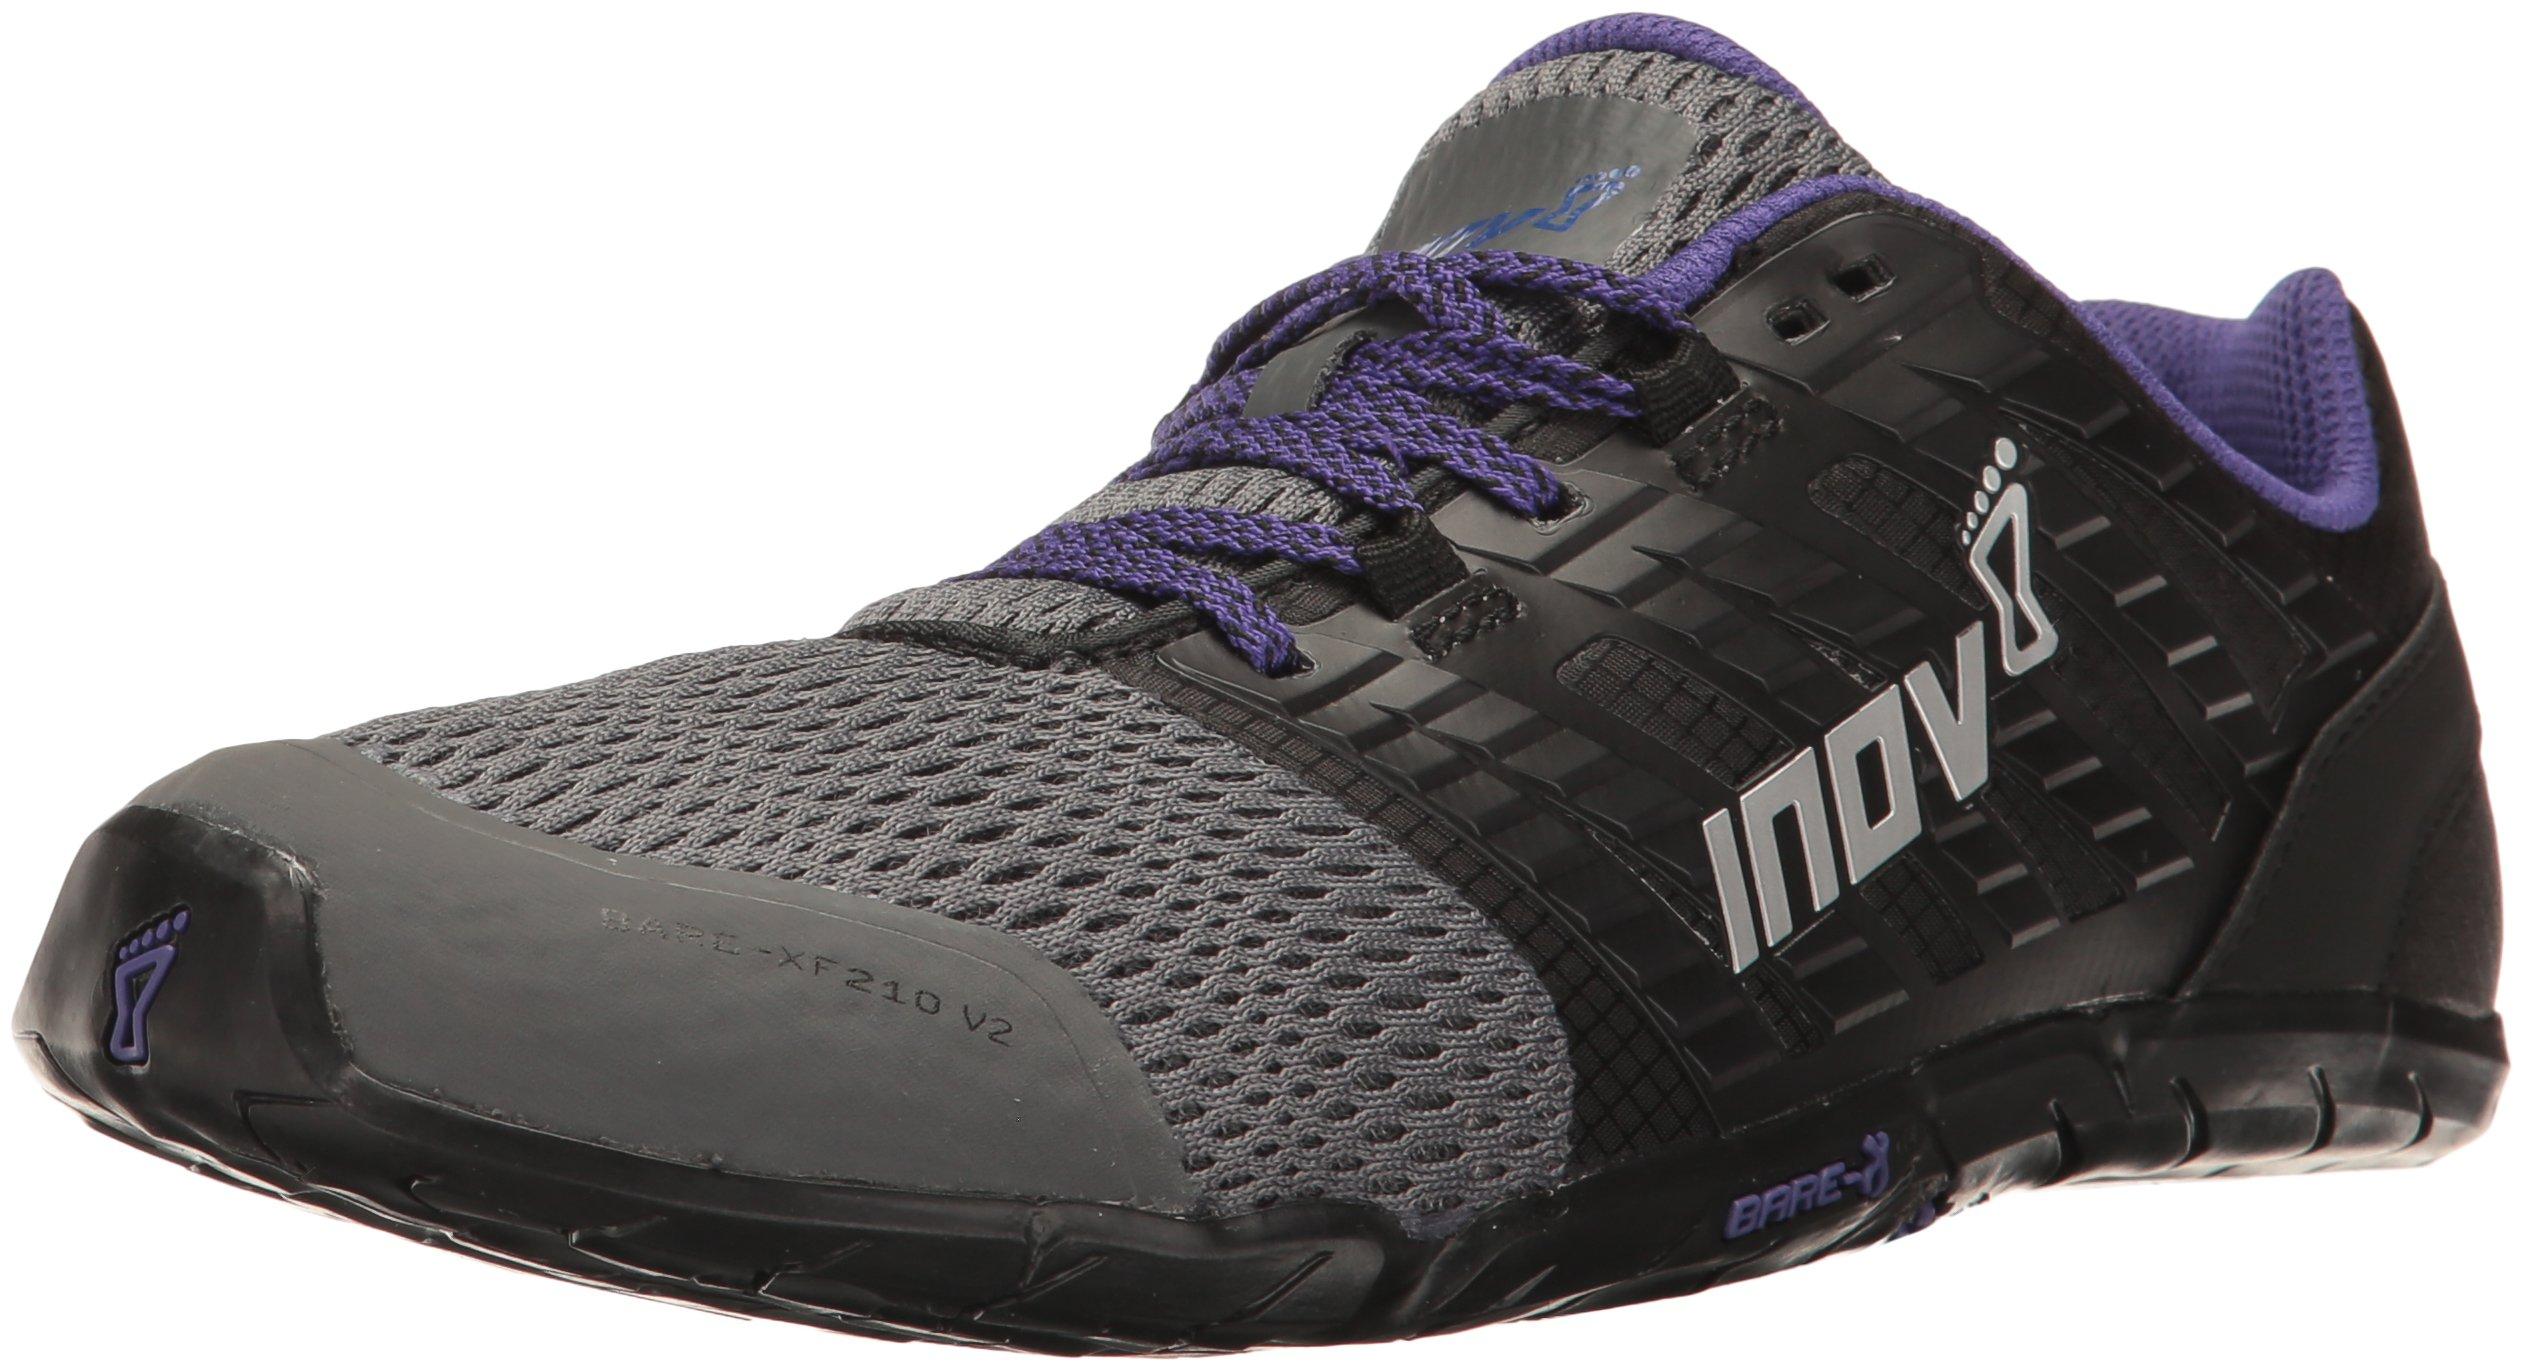 Inov-8 Women's Bare-XF 210 v2 (W) Cross Trainer, Grey/Black/Purple, 8 B US by Inov-8